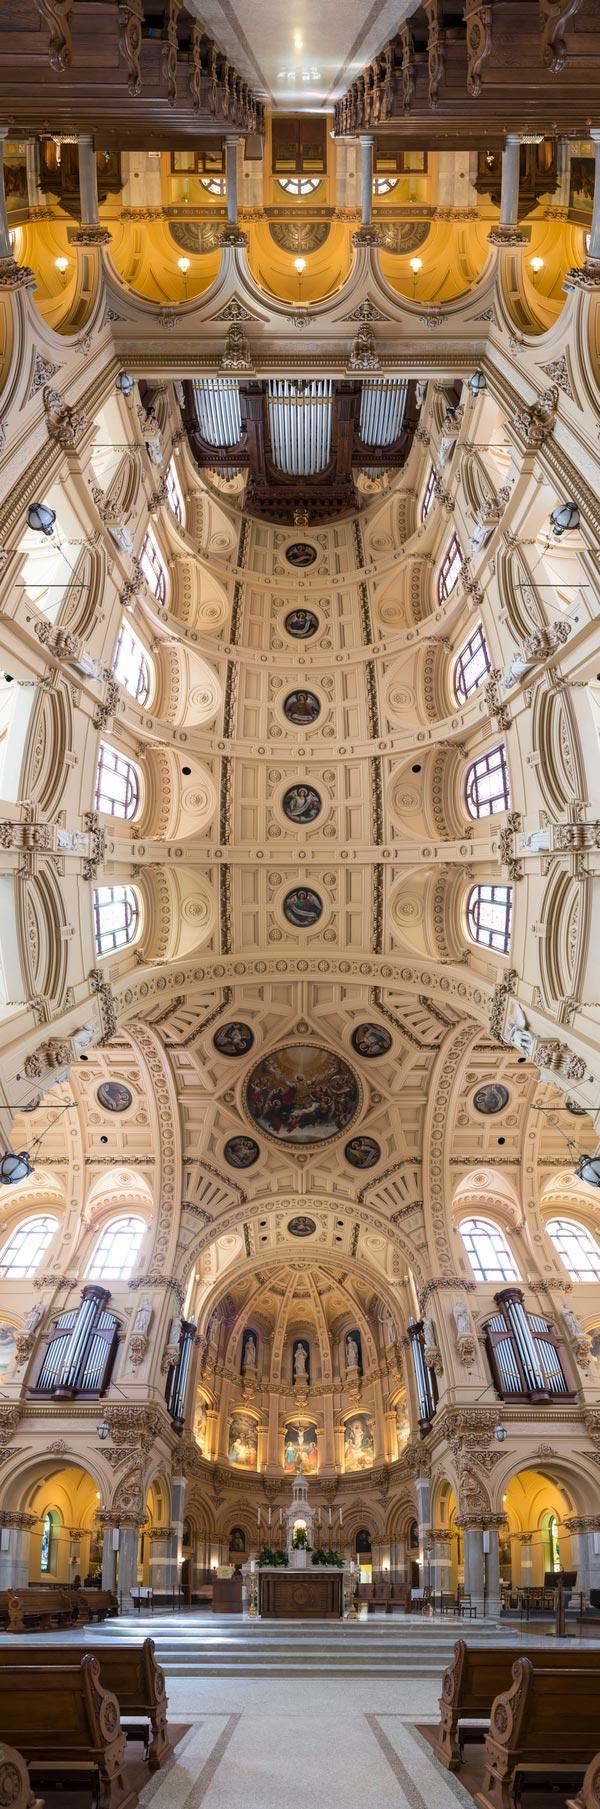 vertical panoramas of church ceilings 1 Amazing Vertical Panoramas of Church Ceilings